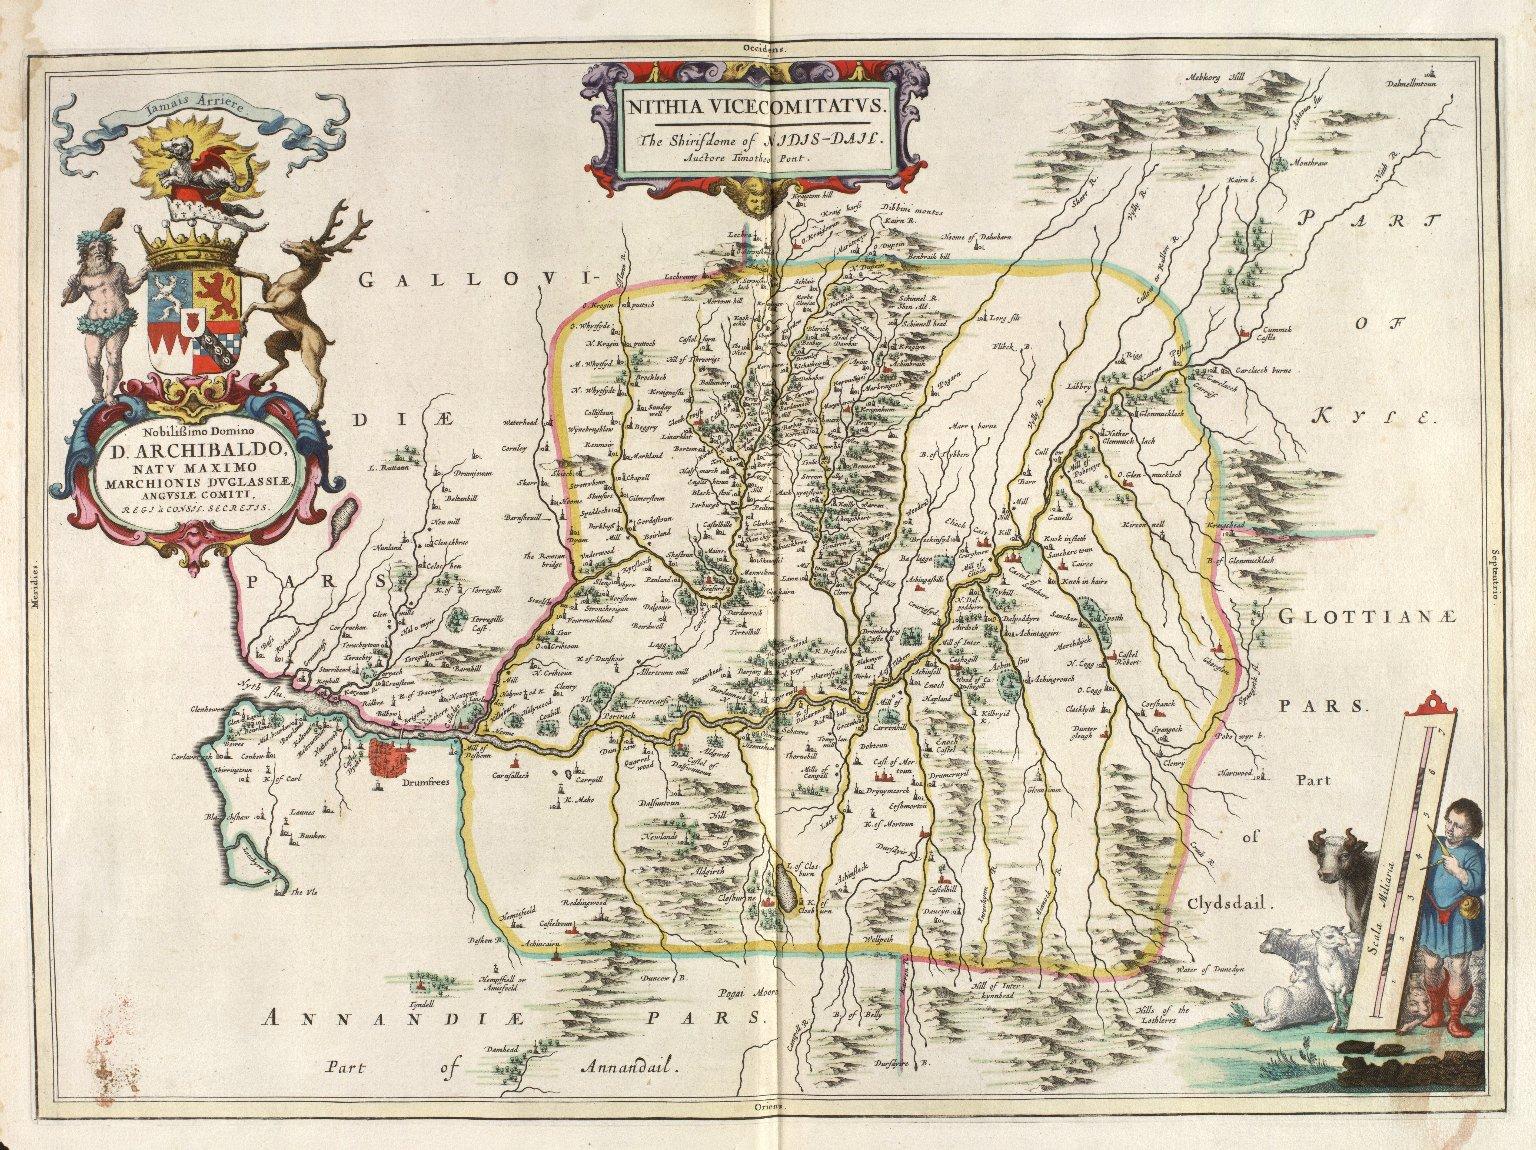 [Geographiae Blavianae] [Also known as: Atlas major] [050 of 153]